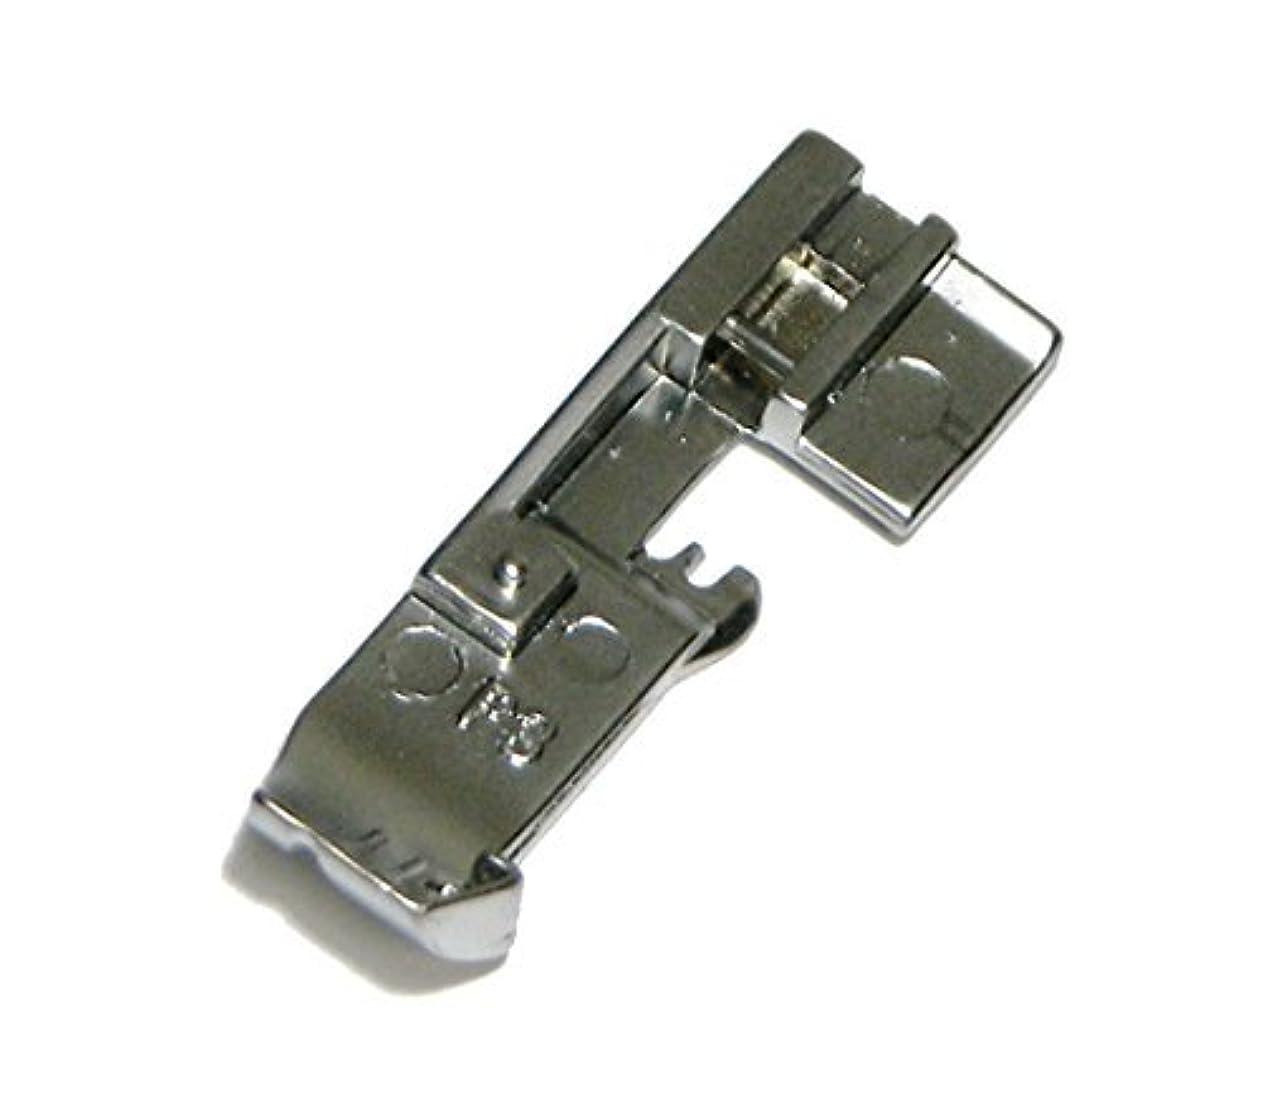 Babylock [ Cording Foot - 3mm ] for Enlighten (BLE3ATW) etc Over Lock Serger Machine jcmmbubmkjh41738